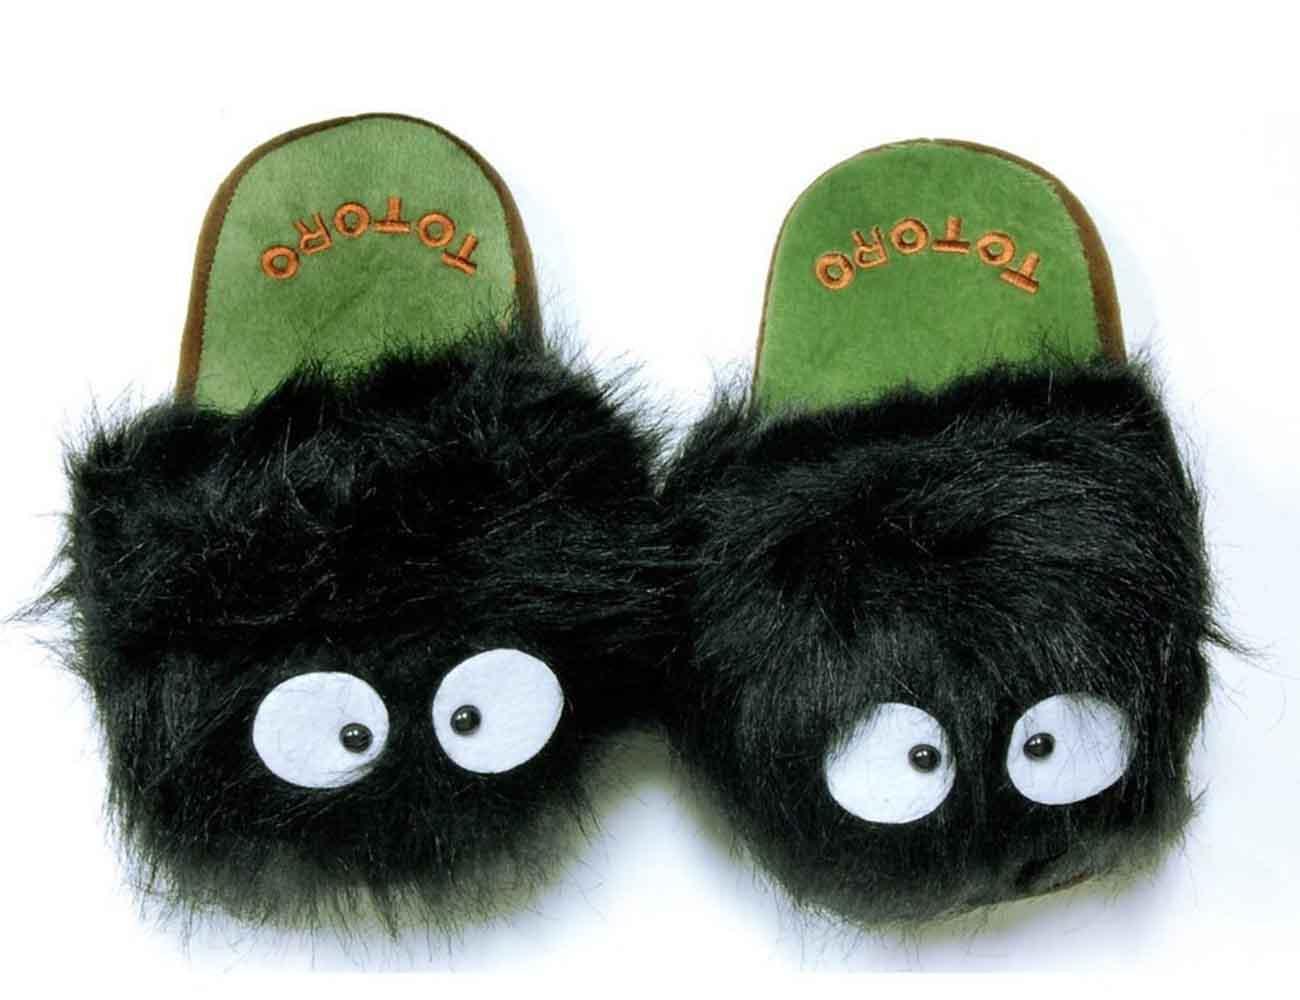 Totoro Dust Bunny Slippers by Studio Ghibli